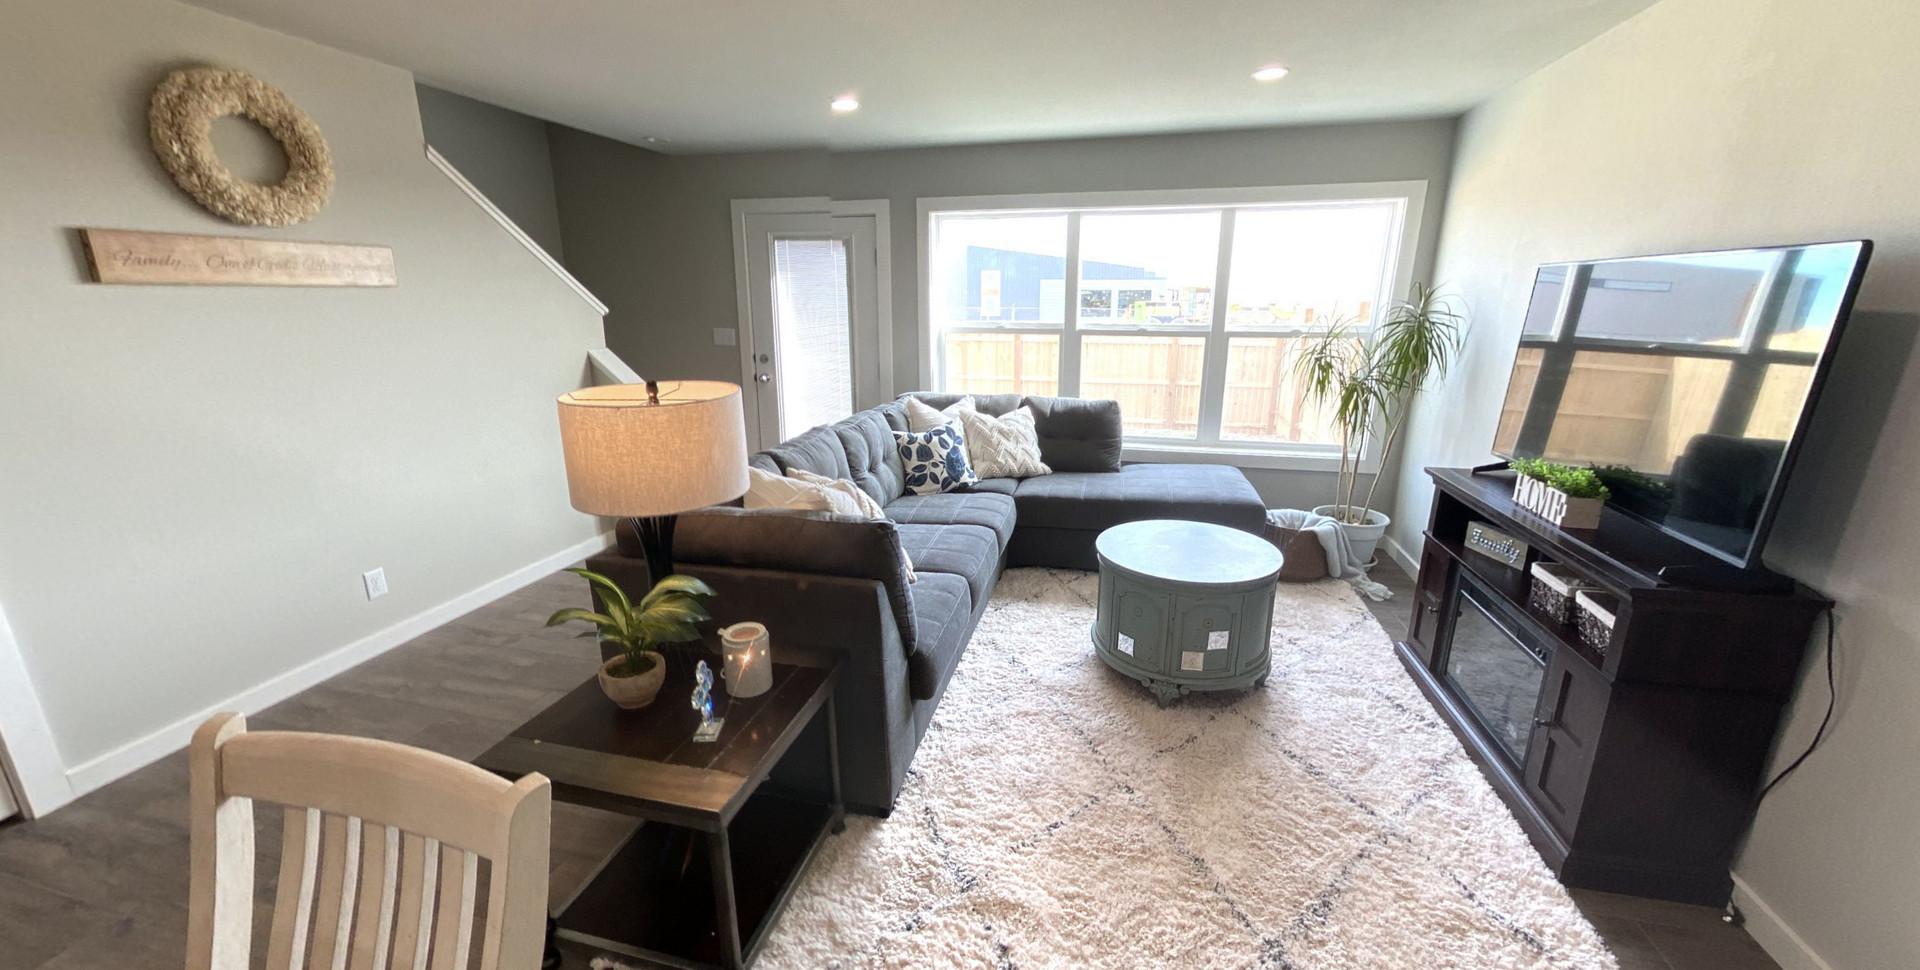 310-Omnia-Living-Room.jpg